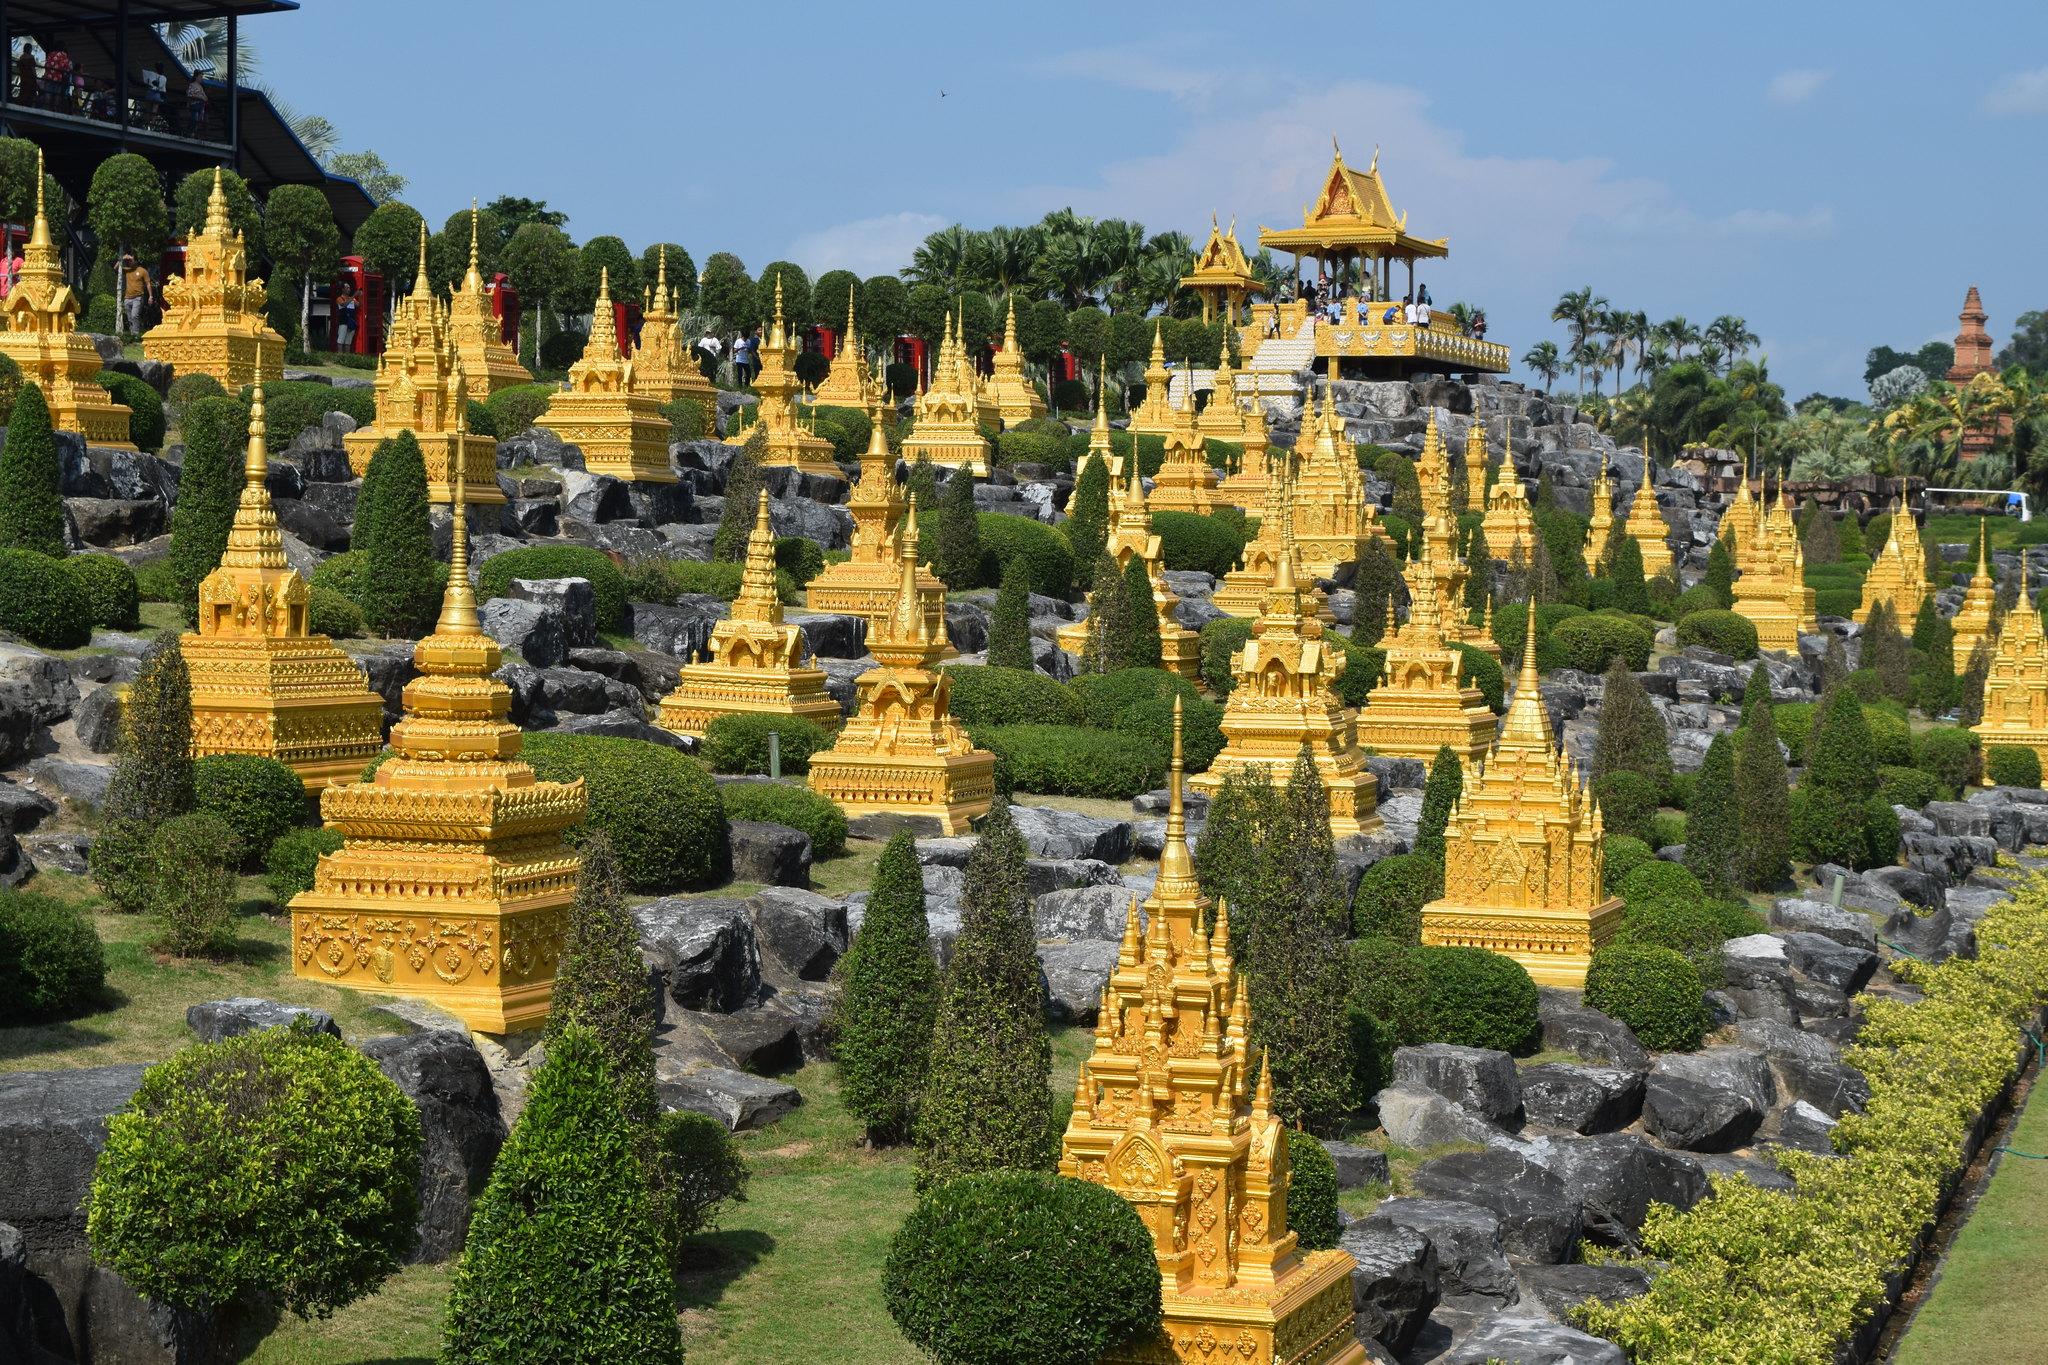 french garden Nong Nooch Tropical Botanical Garden Pattaya Thailnd travel photographer